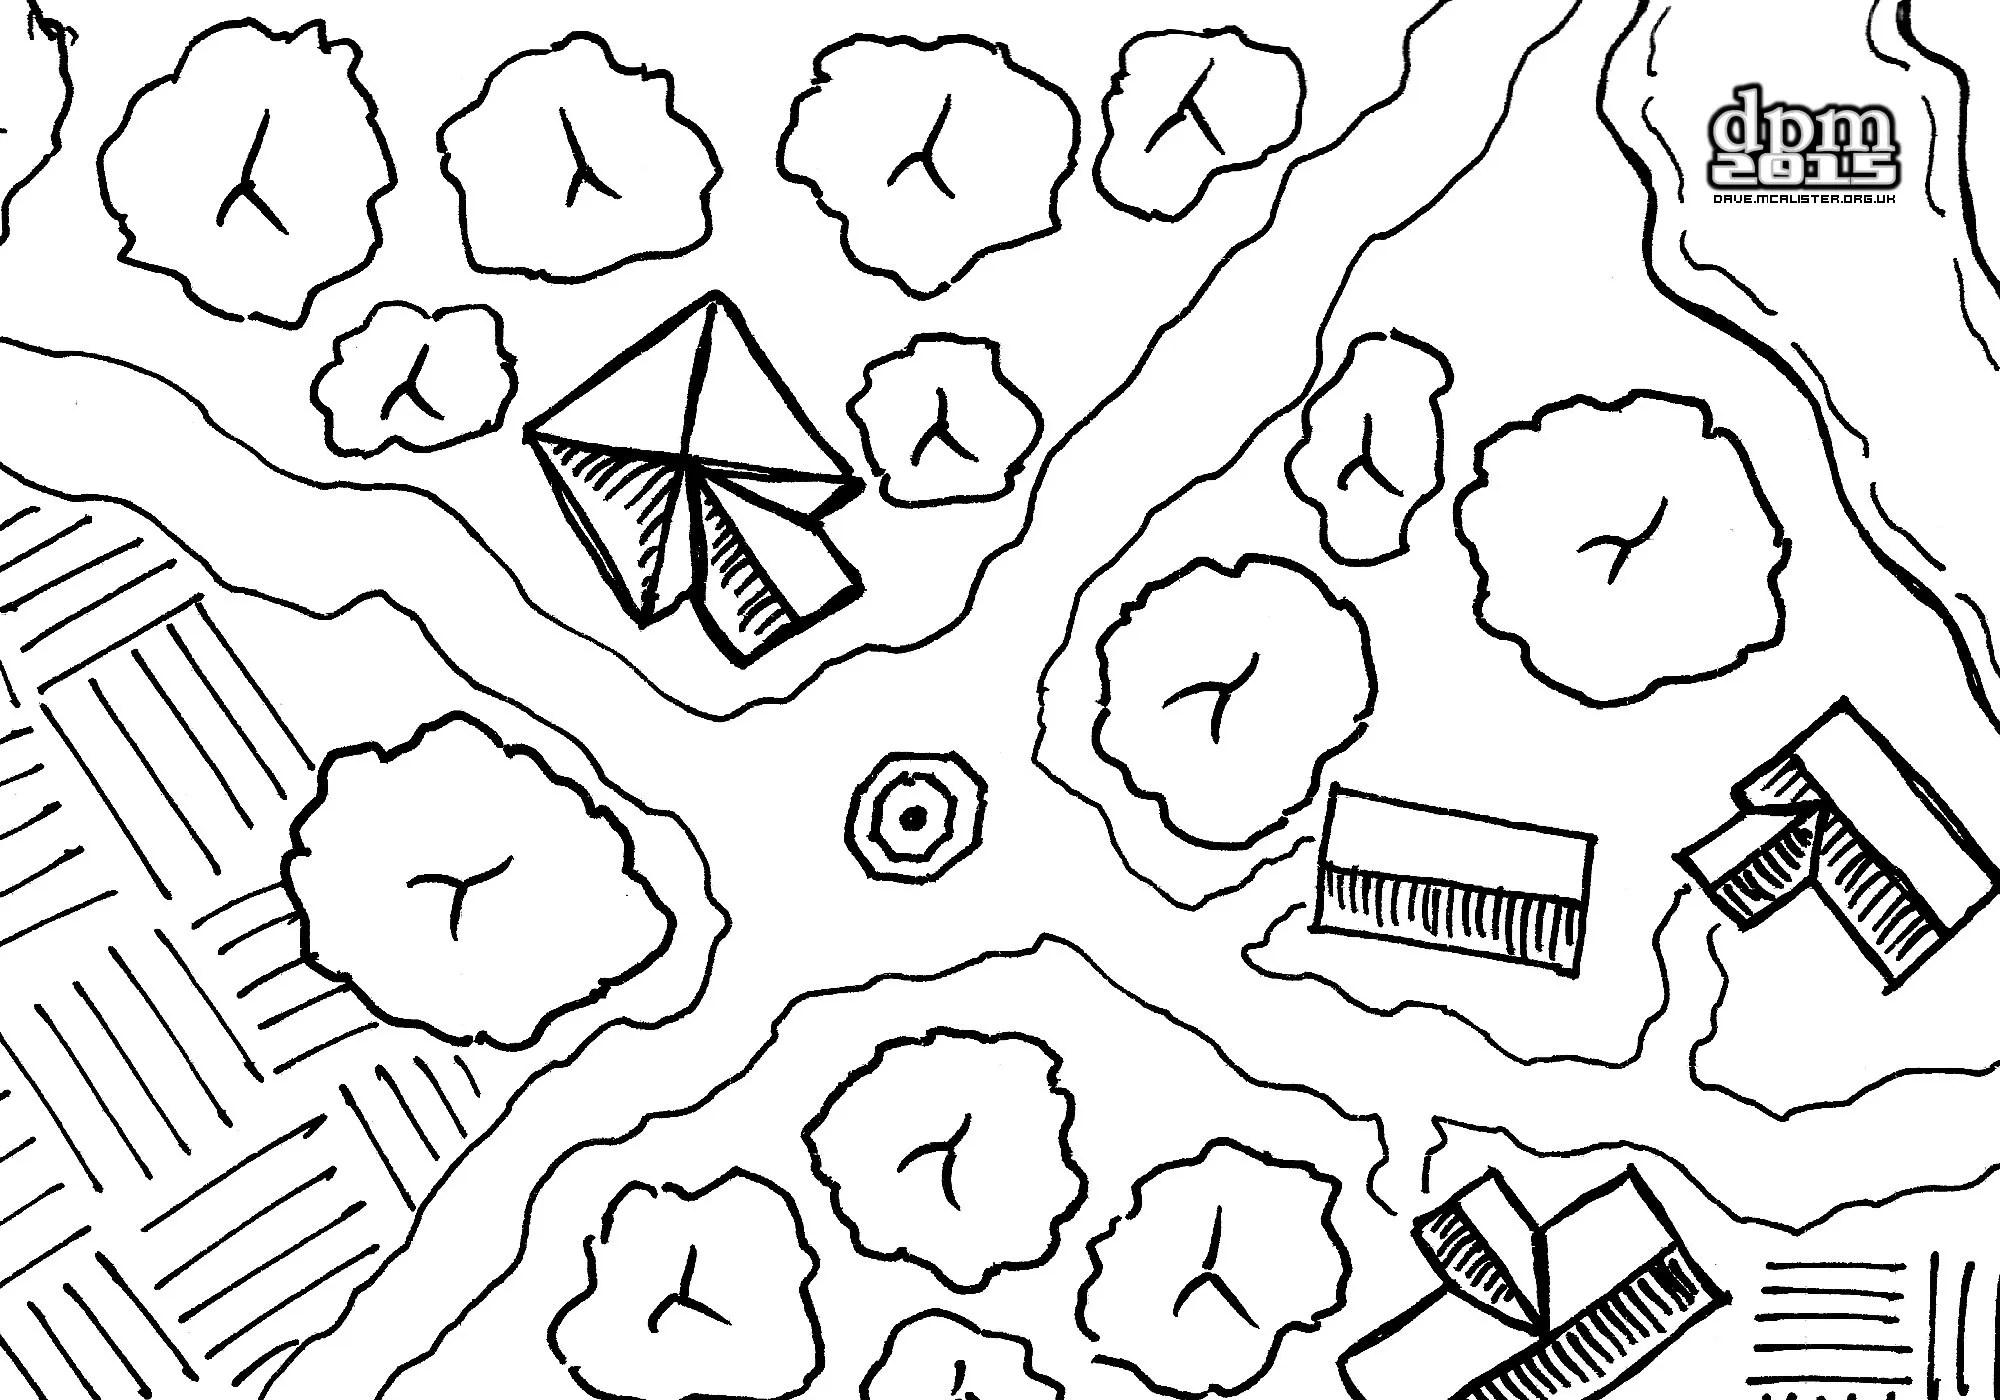 [Friday Map] Logging Village